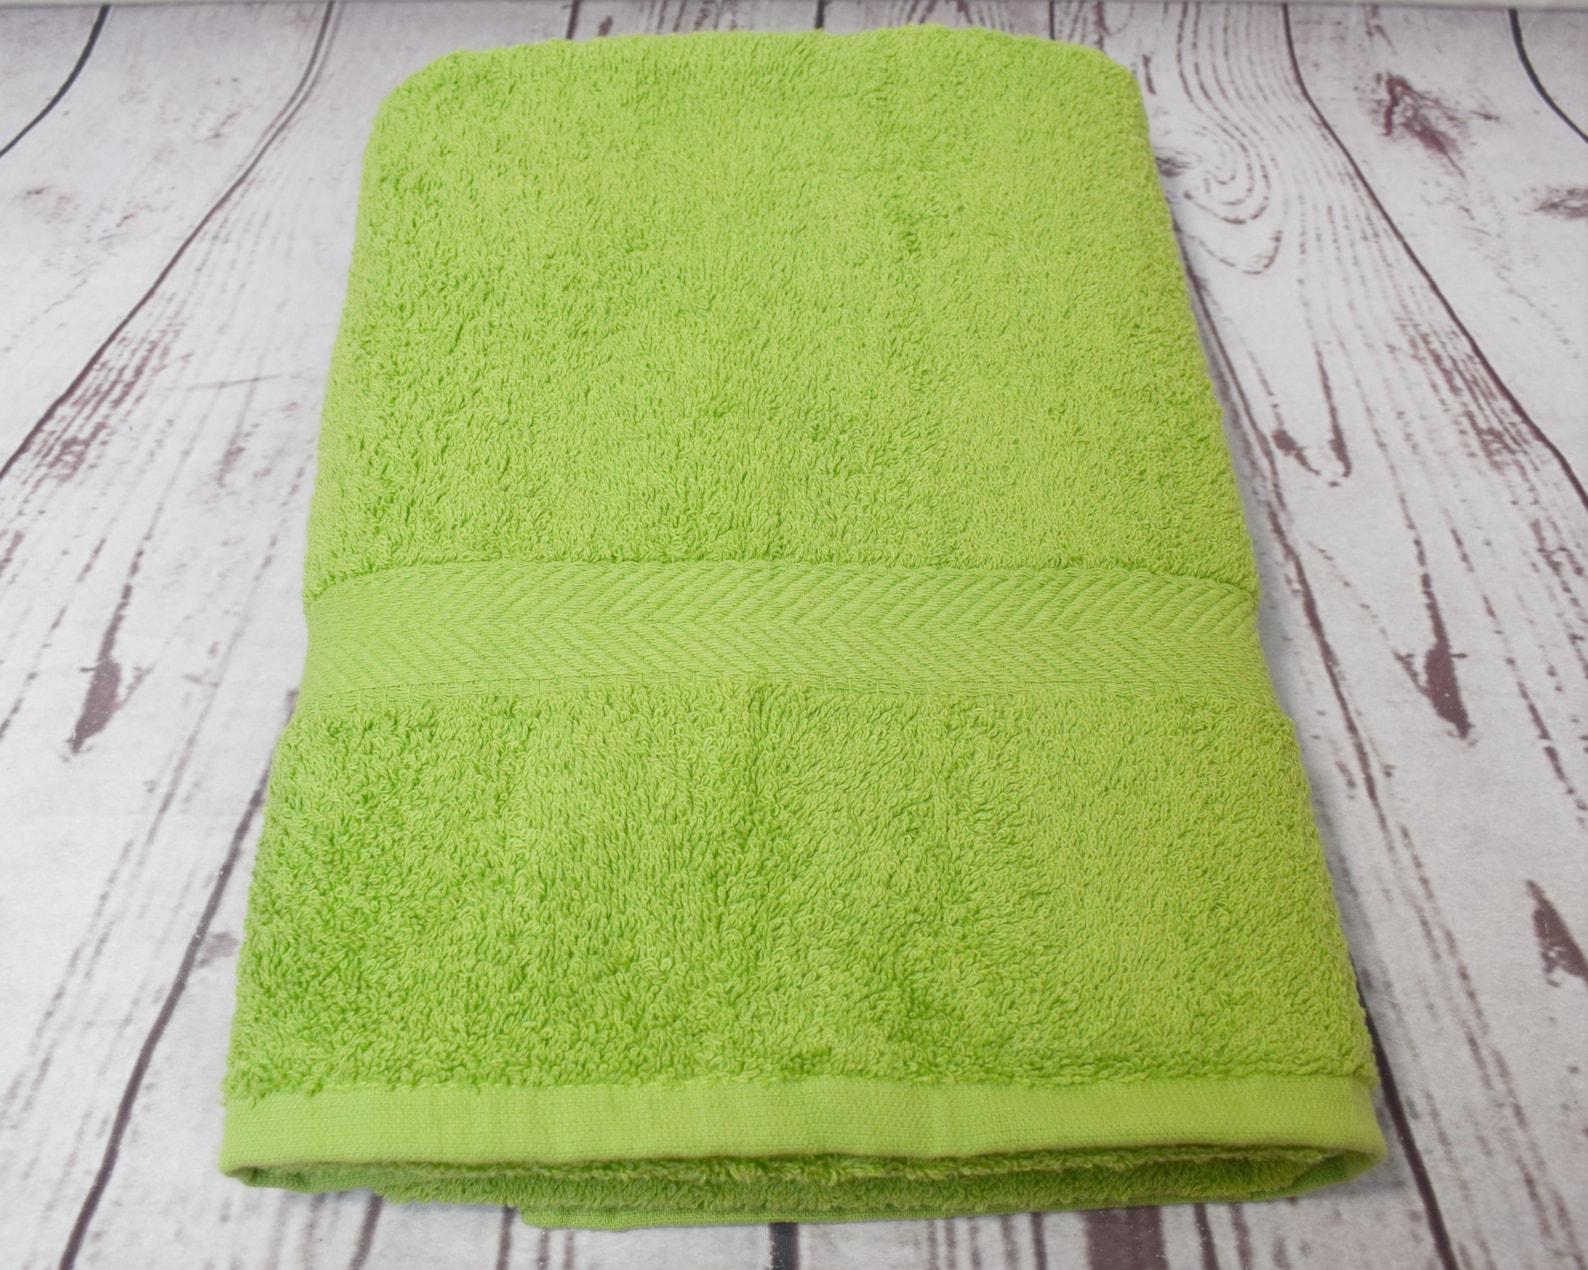 personalised kids bath towel, pink ballet shoes bath towel, children's ballet shoes swim towel, embroidered bath towel (choi